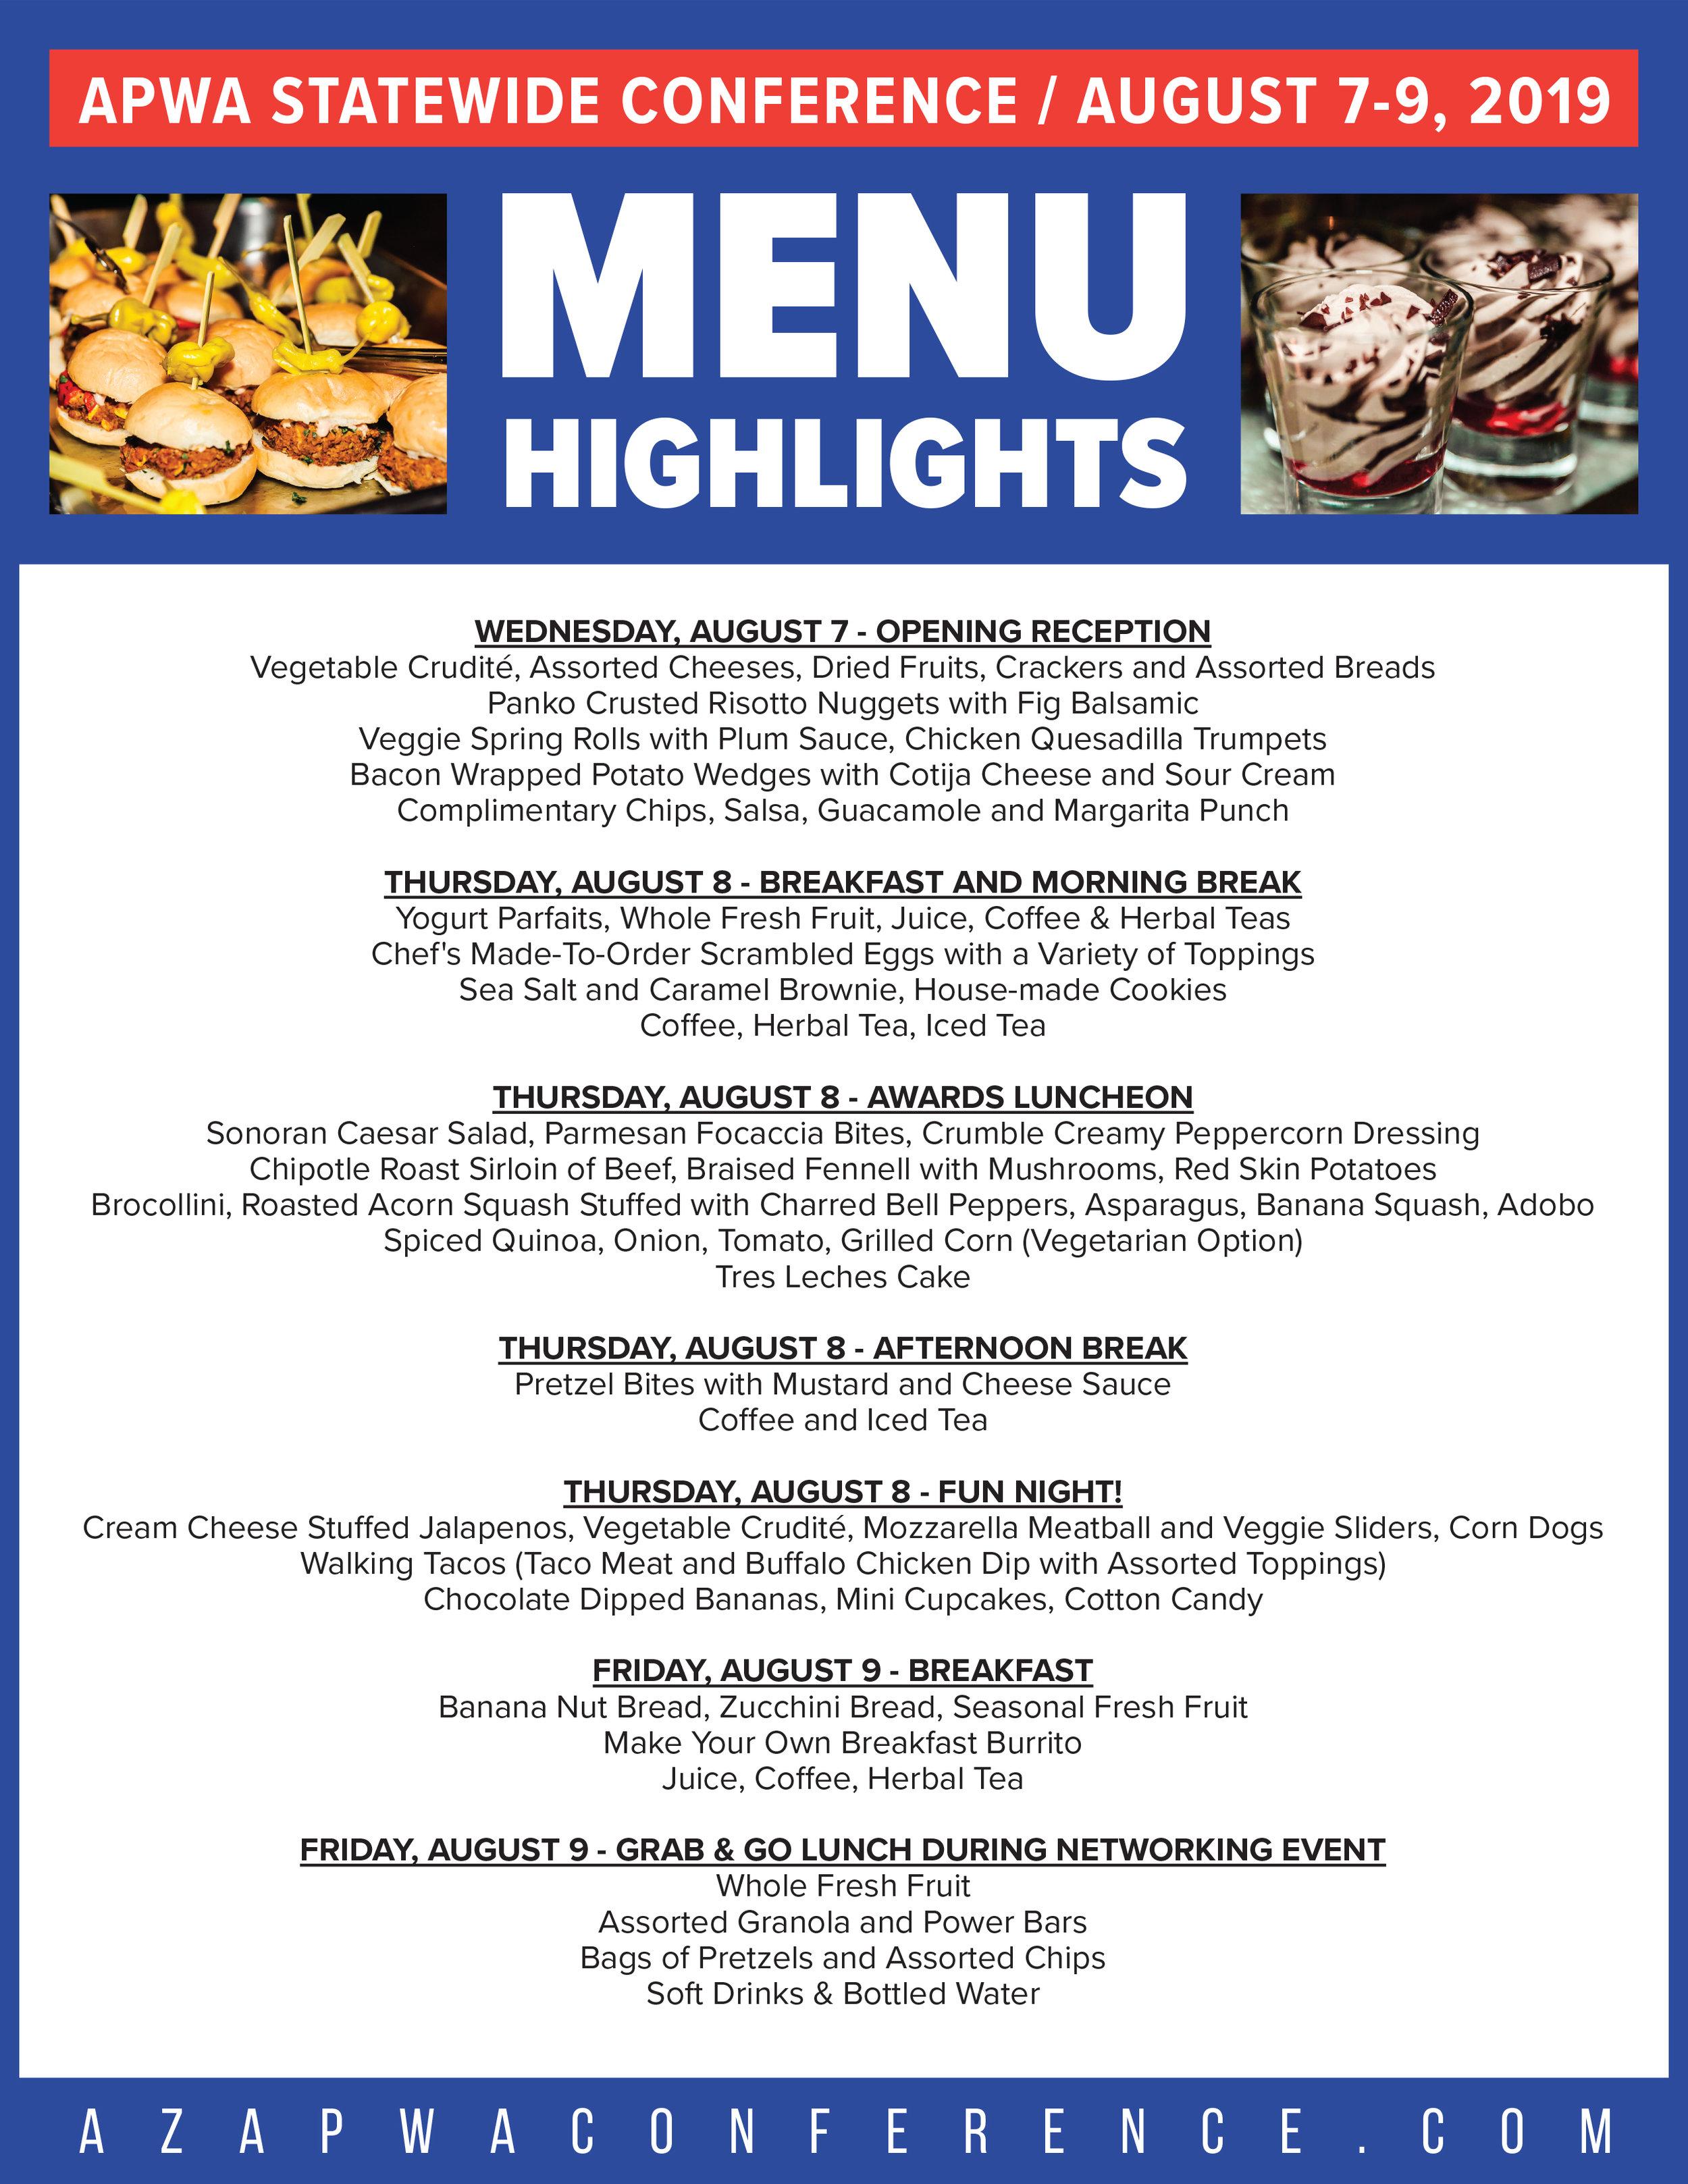 APWA Conference FOOD PROMO 07-17-19.jpg